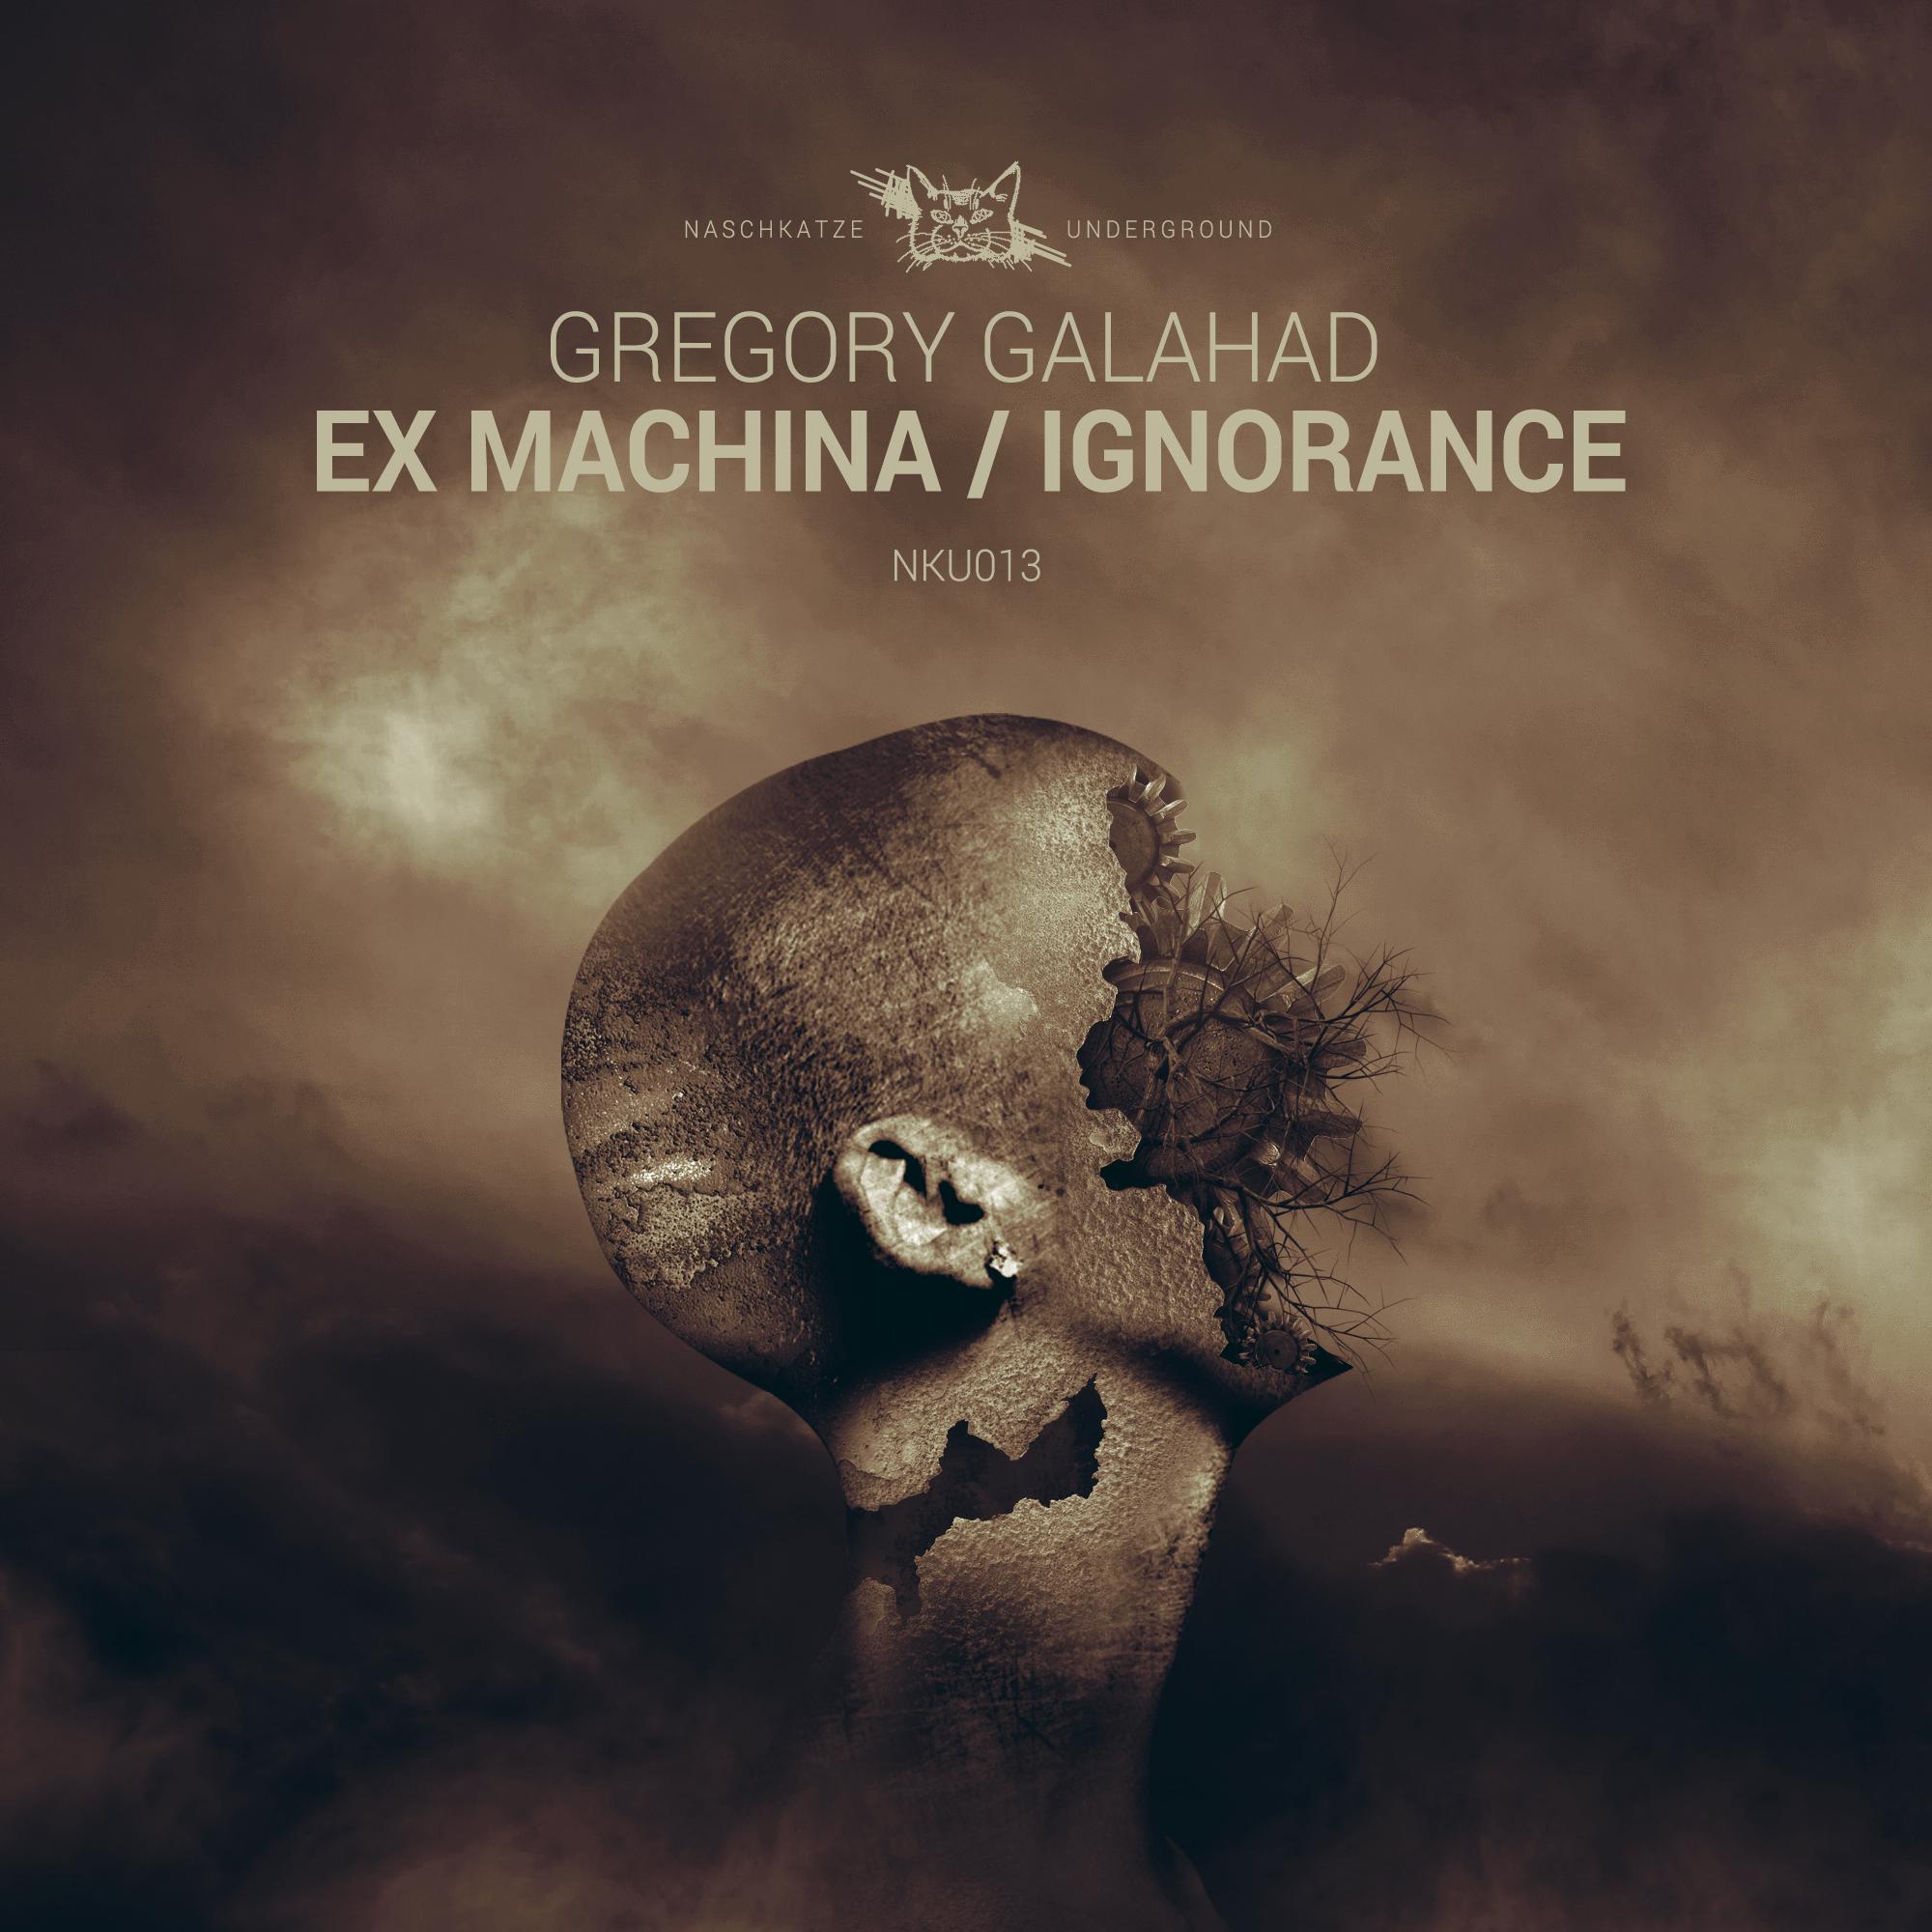 Ex Machina / Ignorance